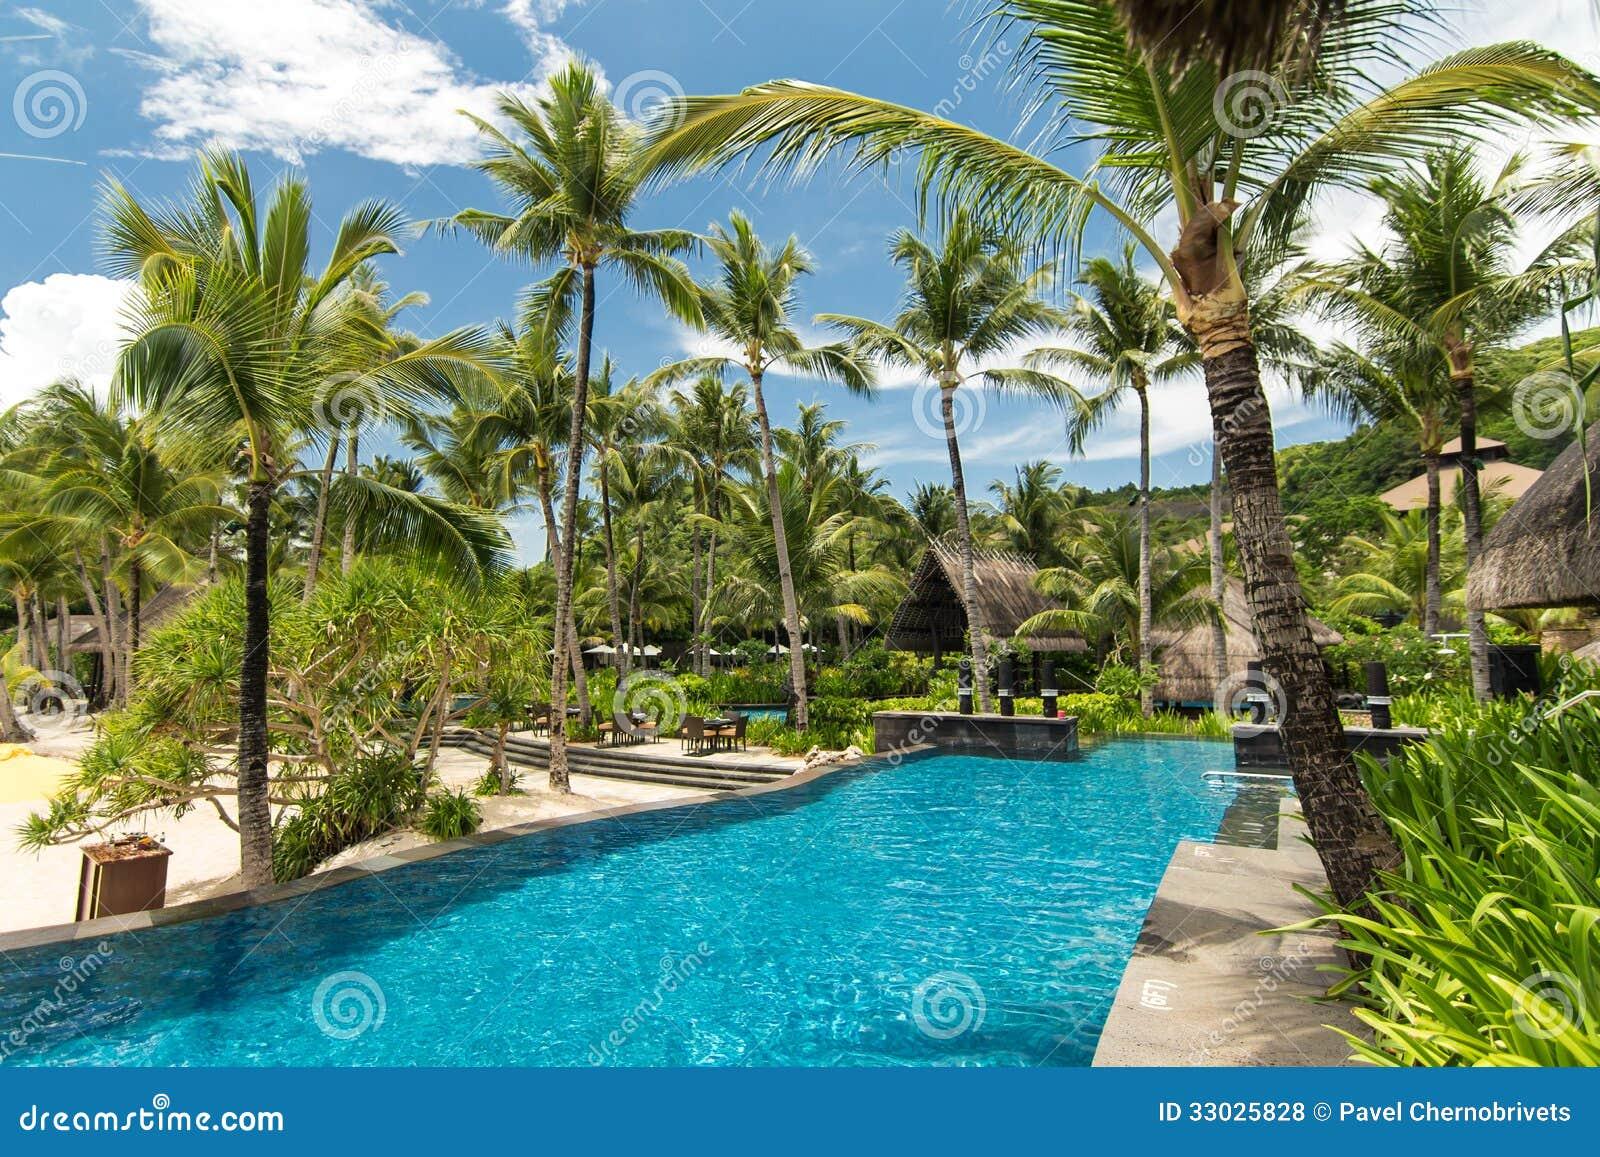 Swimming Pool In Resort Royalty Free Stock Photos Image